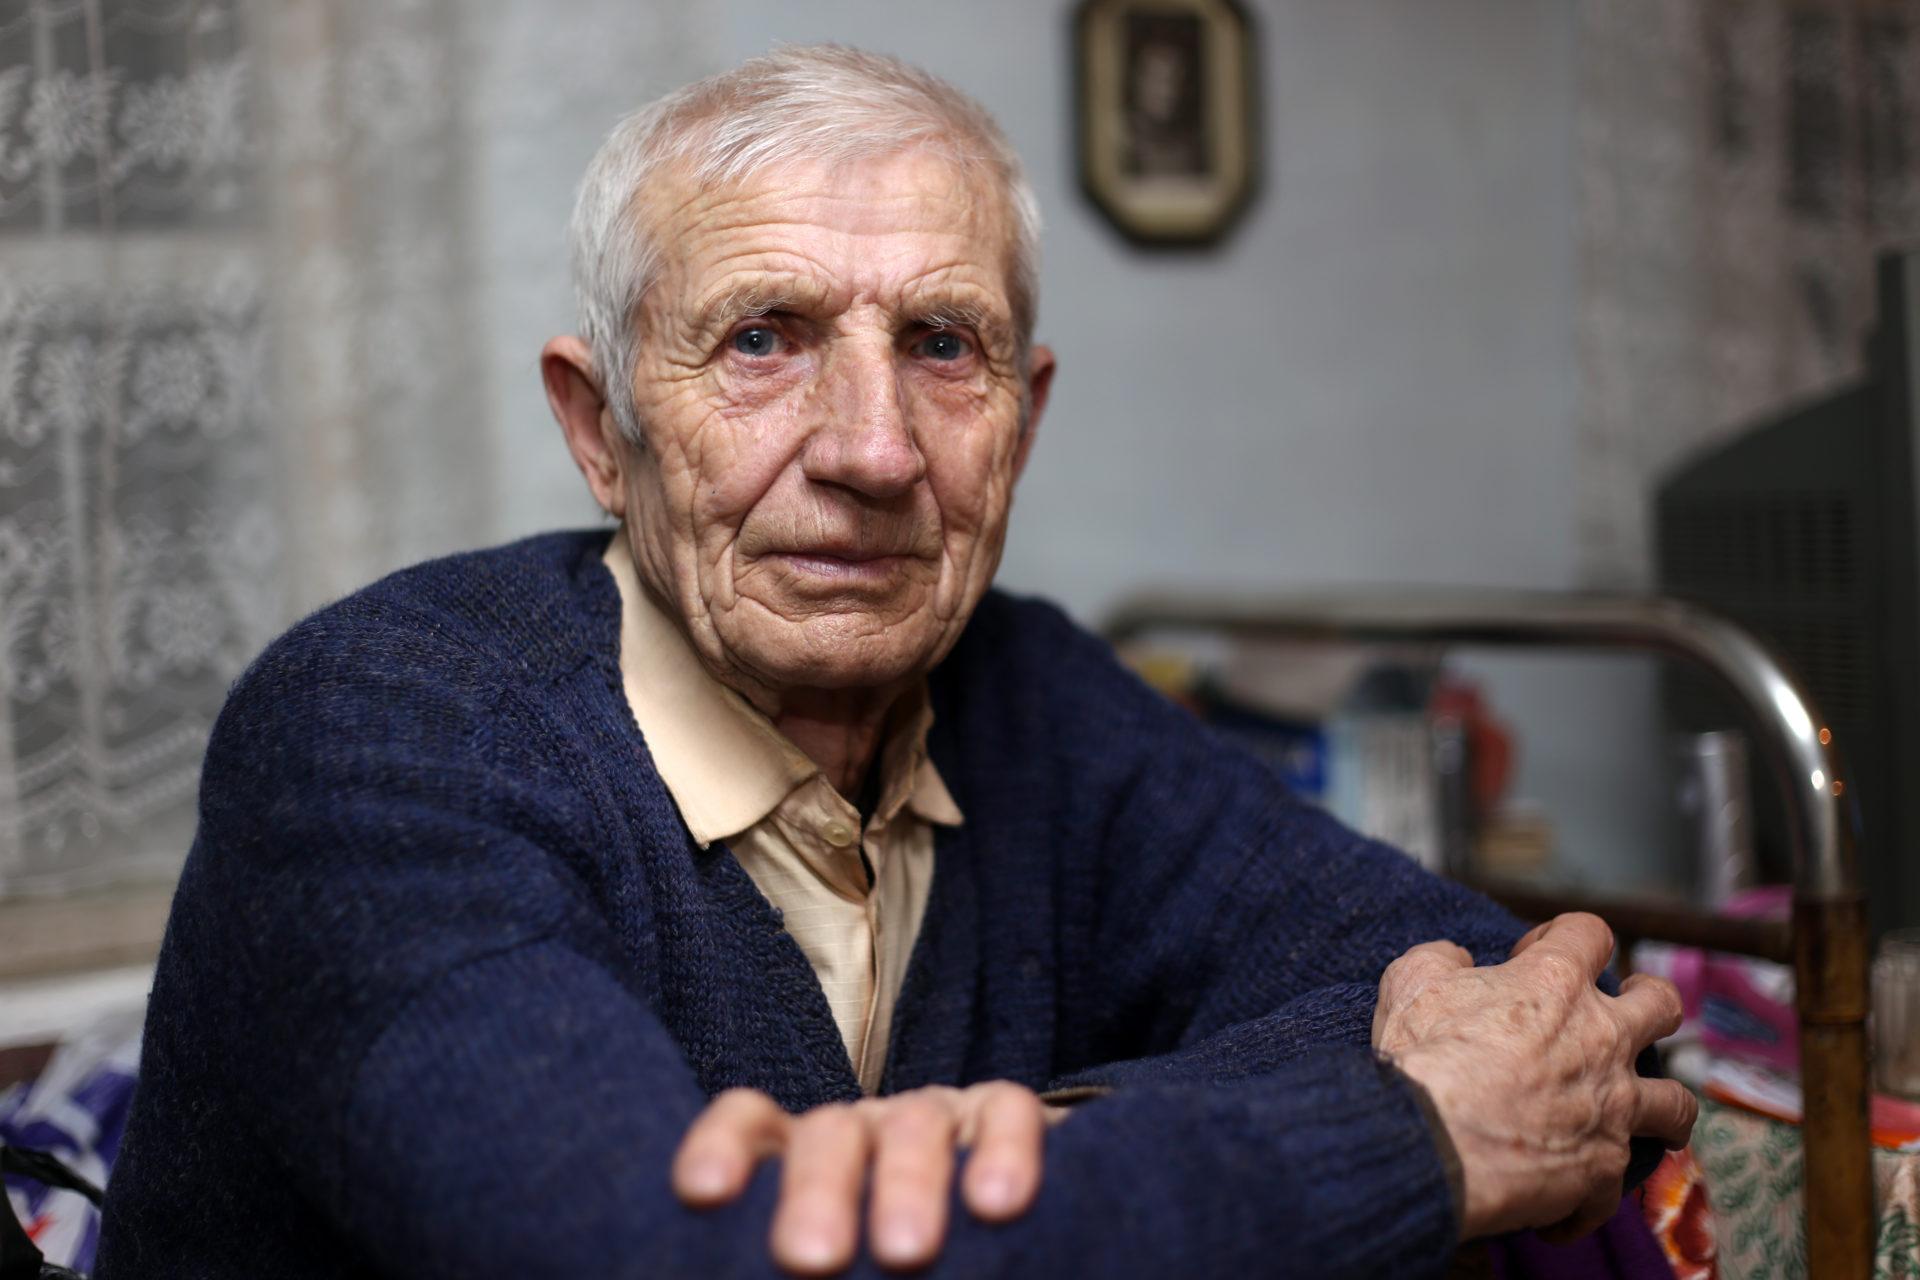 an elderly man sitting alone